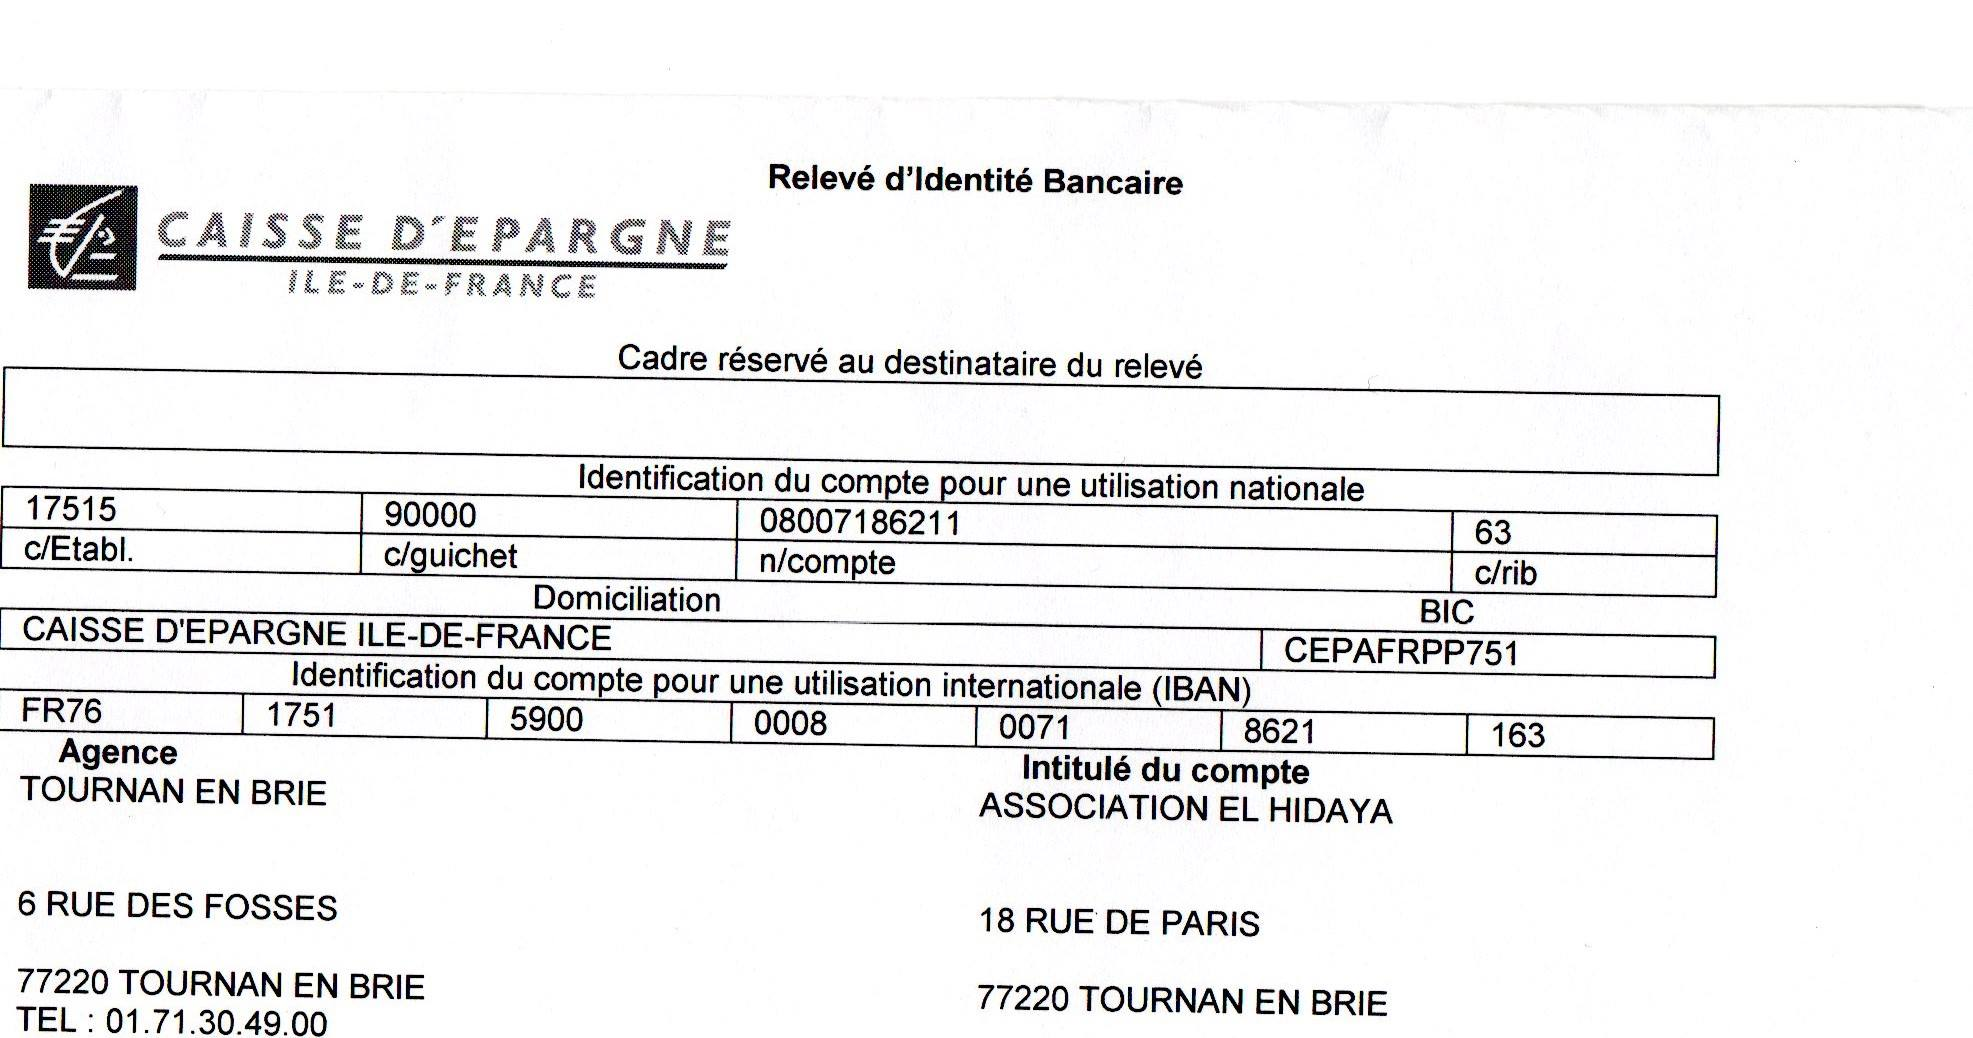 Coordonnées bancaires de l'association El Hidaya de Tournan-en-Brie